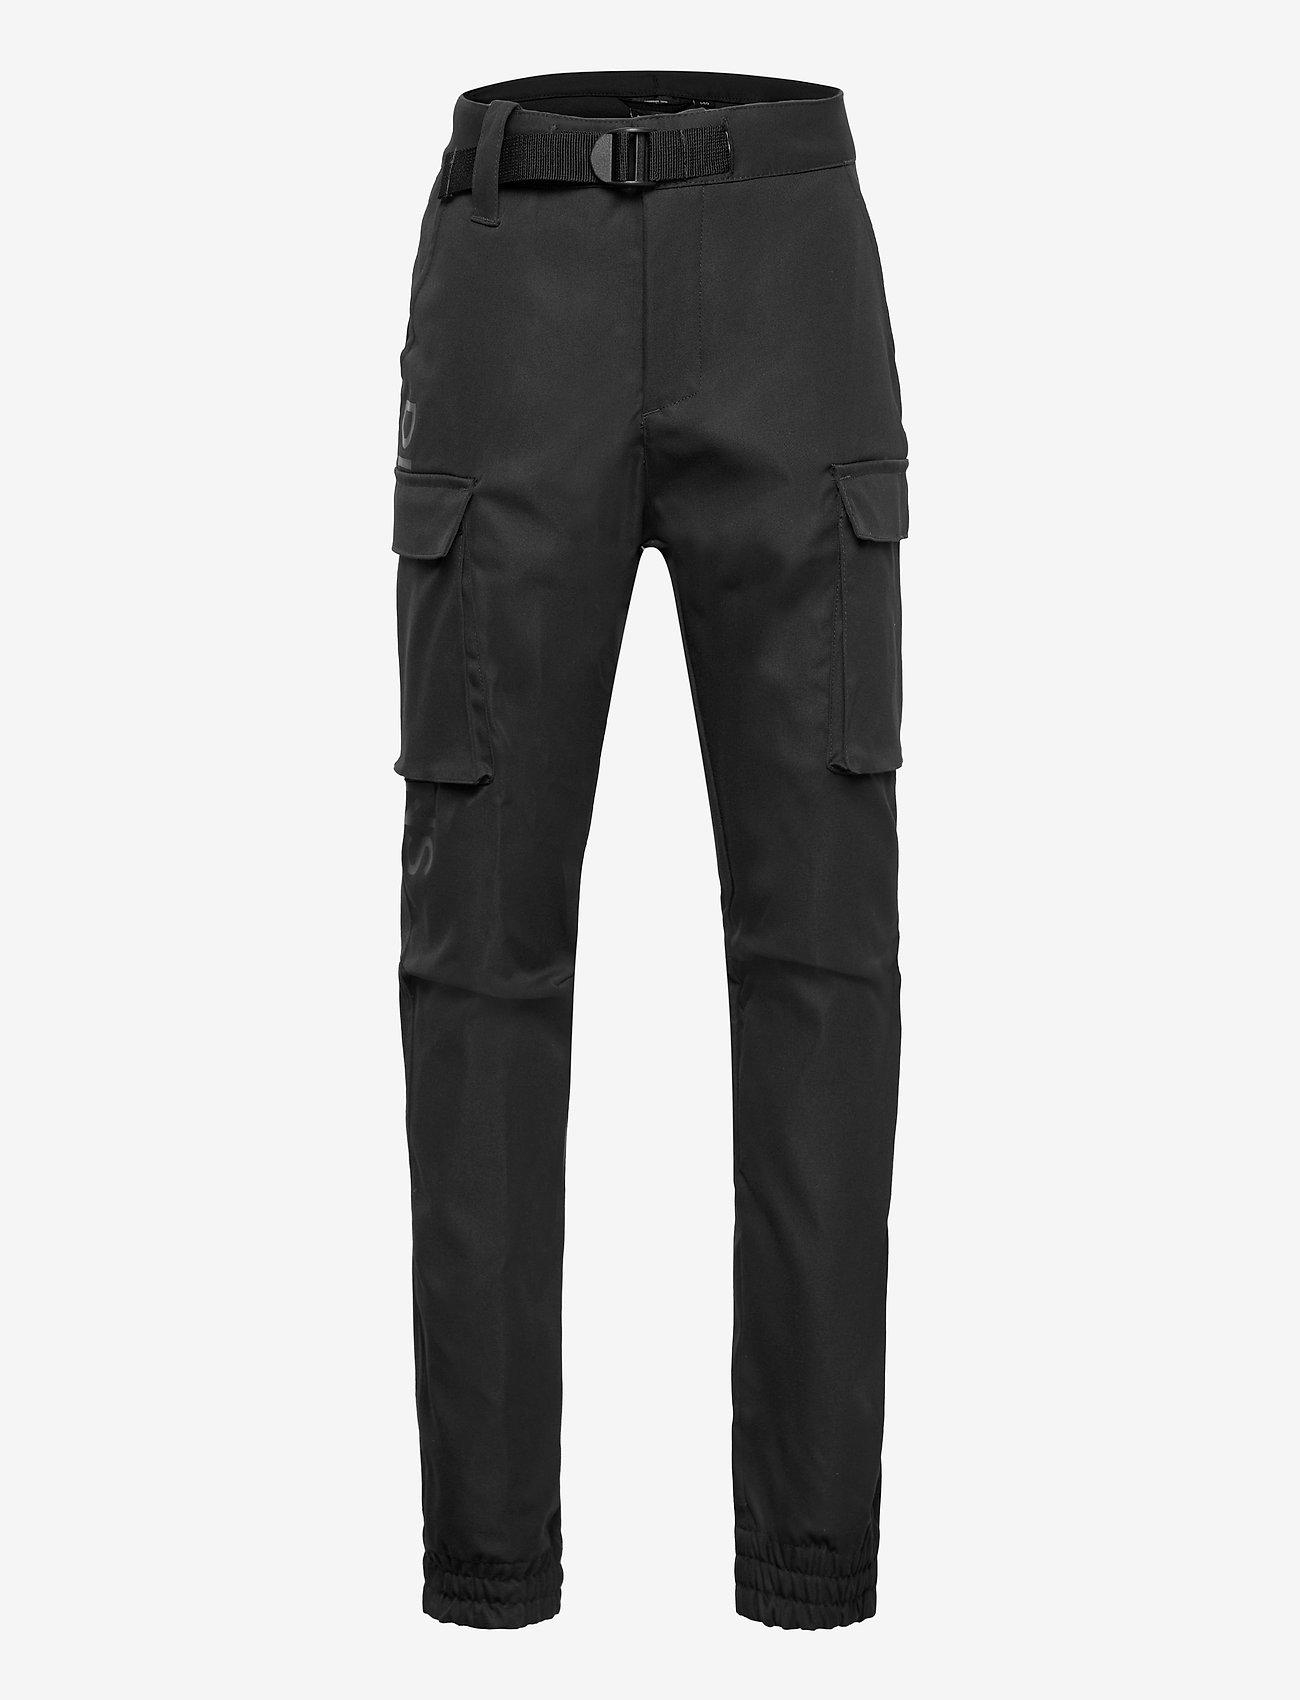 Didriksons - LIAS UNISEX PANT - sports pants - black - 1